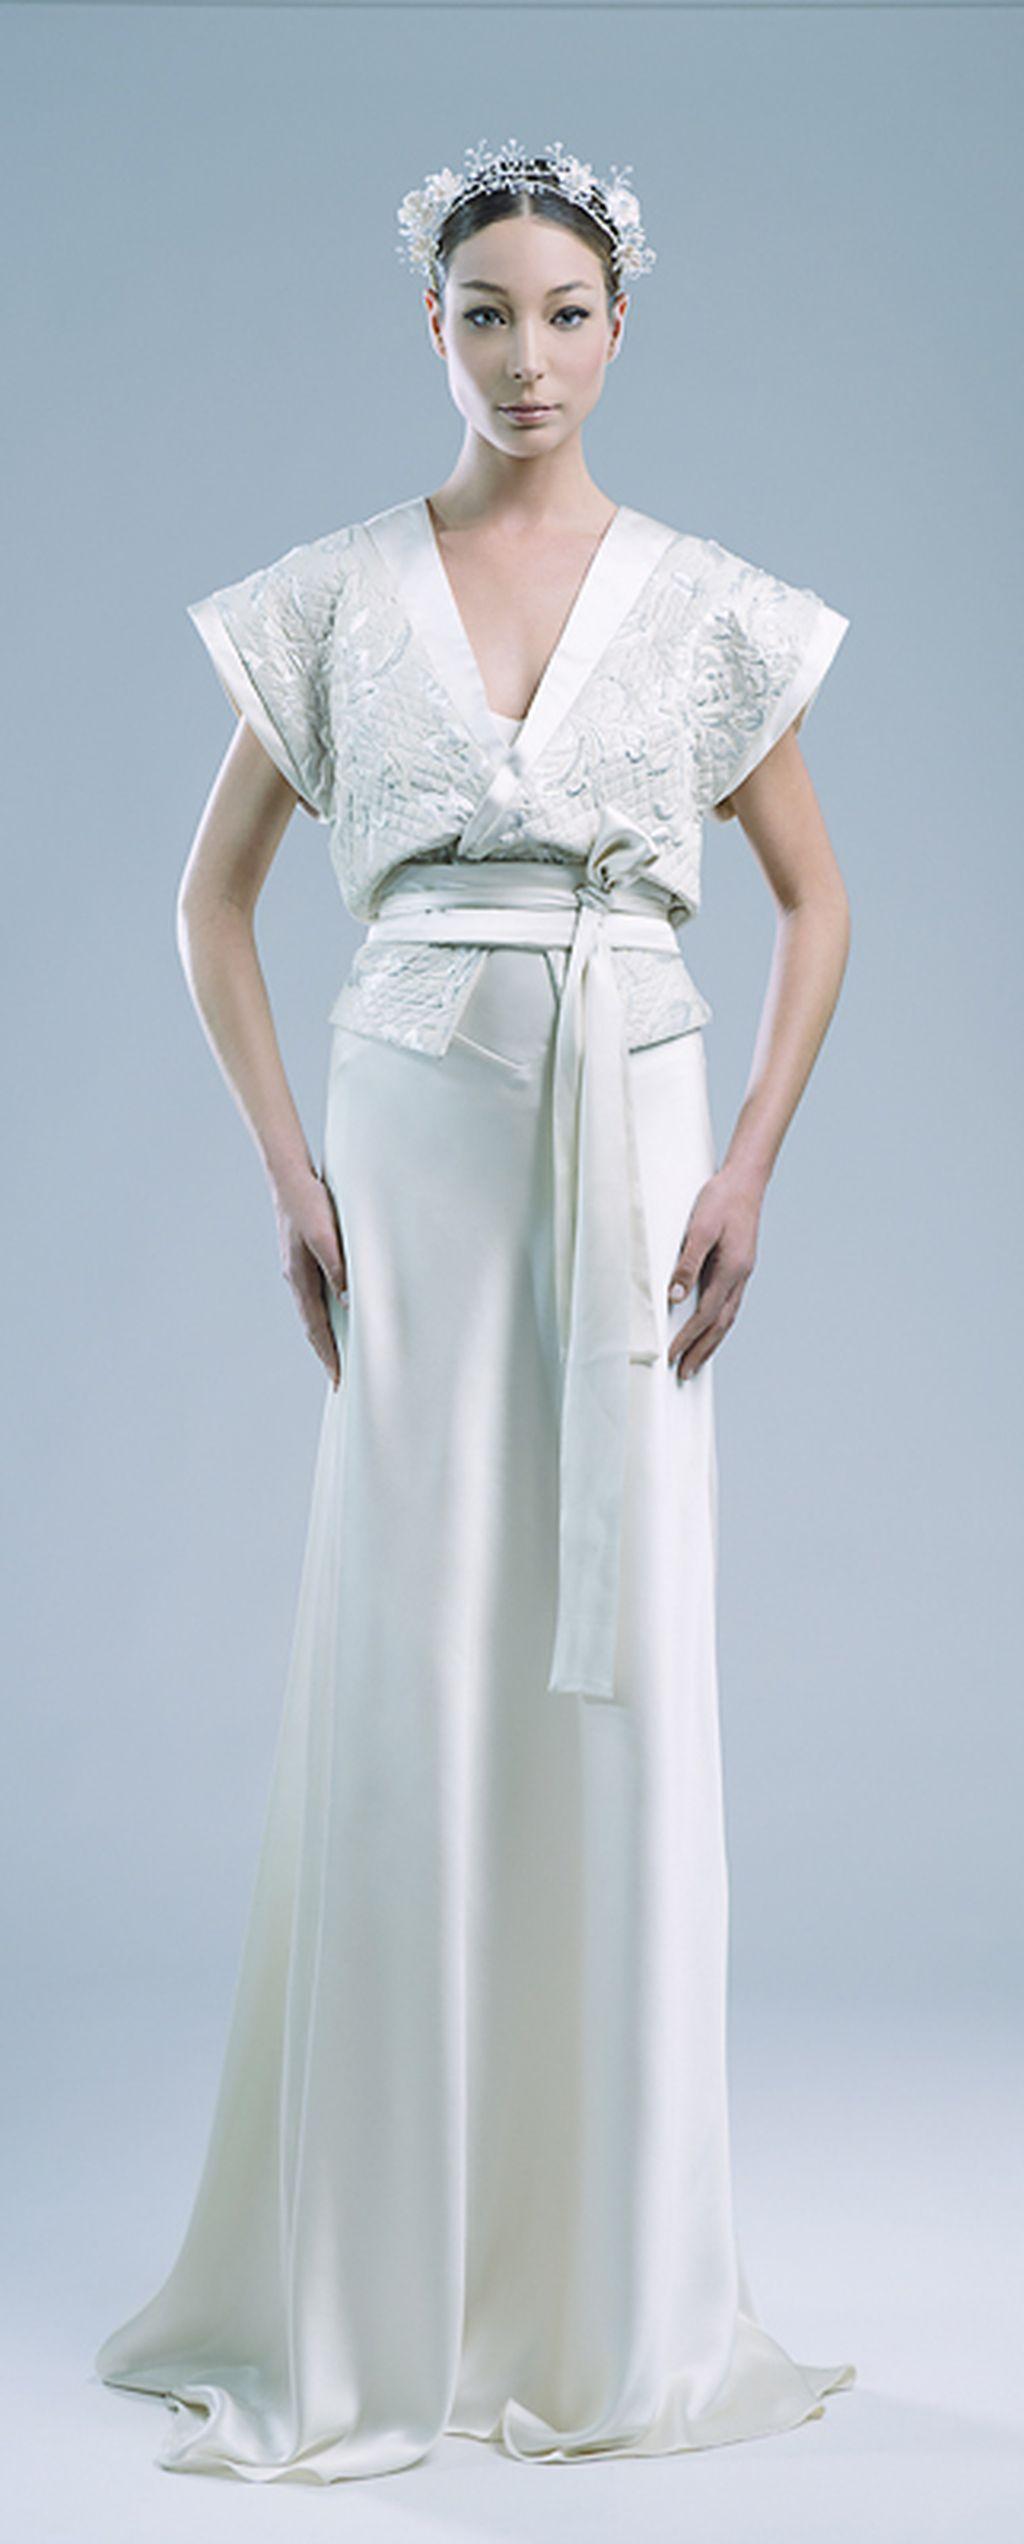 99 Unique Japanese Wedding Dress Ideas for Your Inspirations | Dress ...